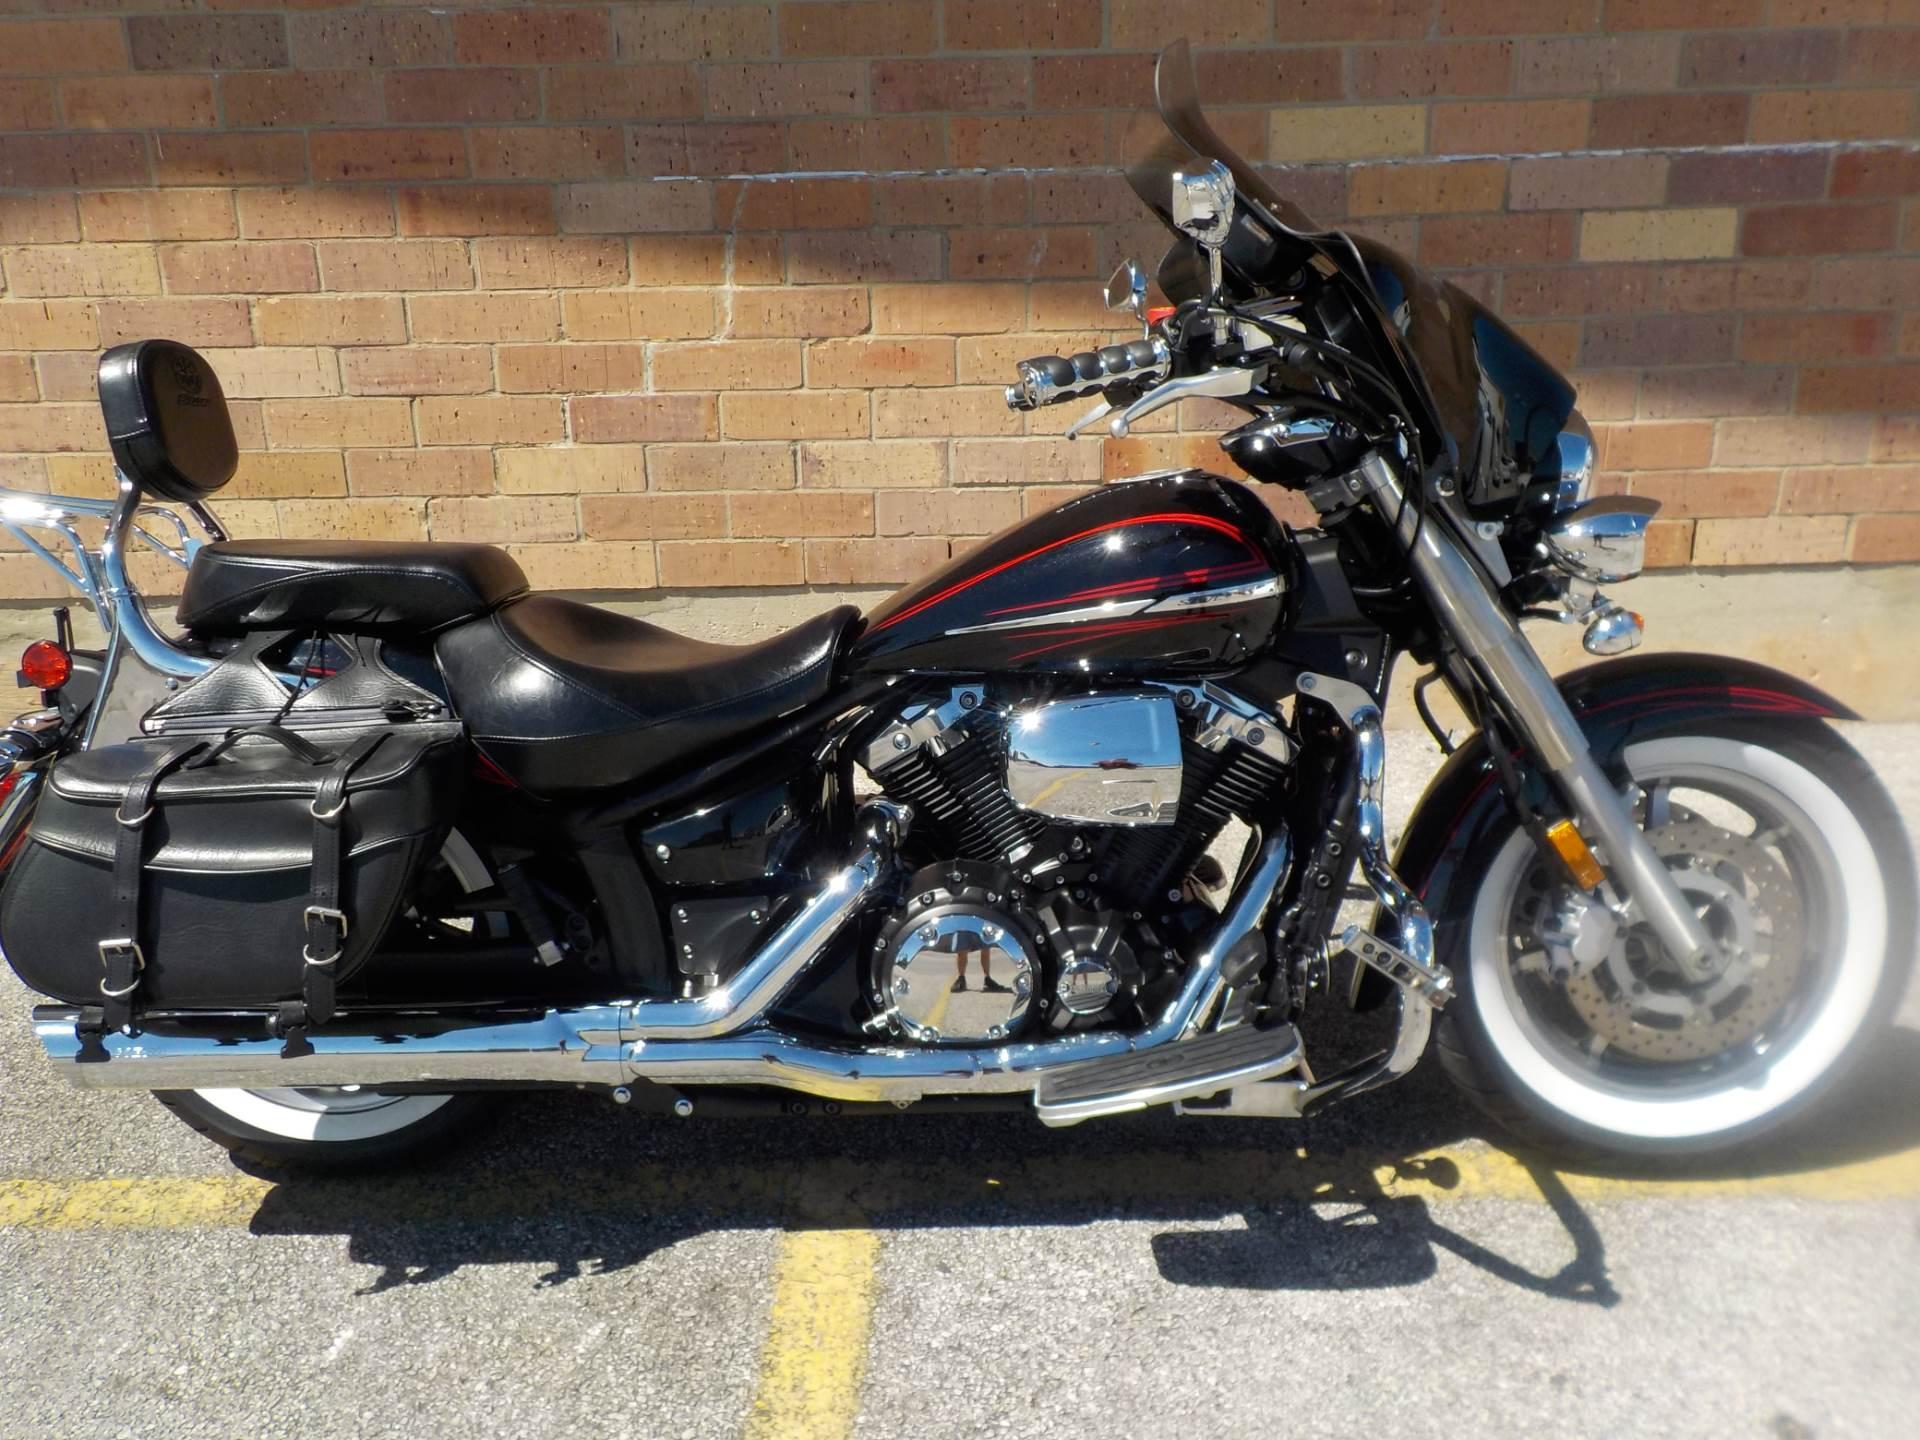 2009 Yamaha V Star 1300 for sale 450